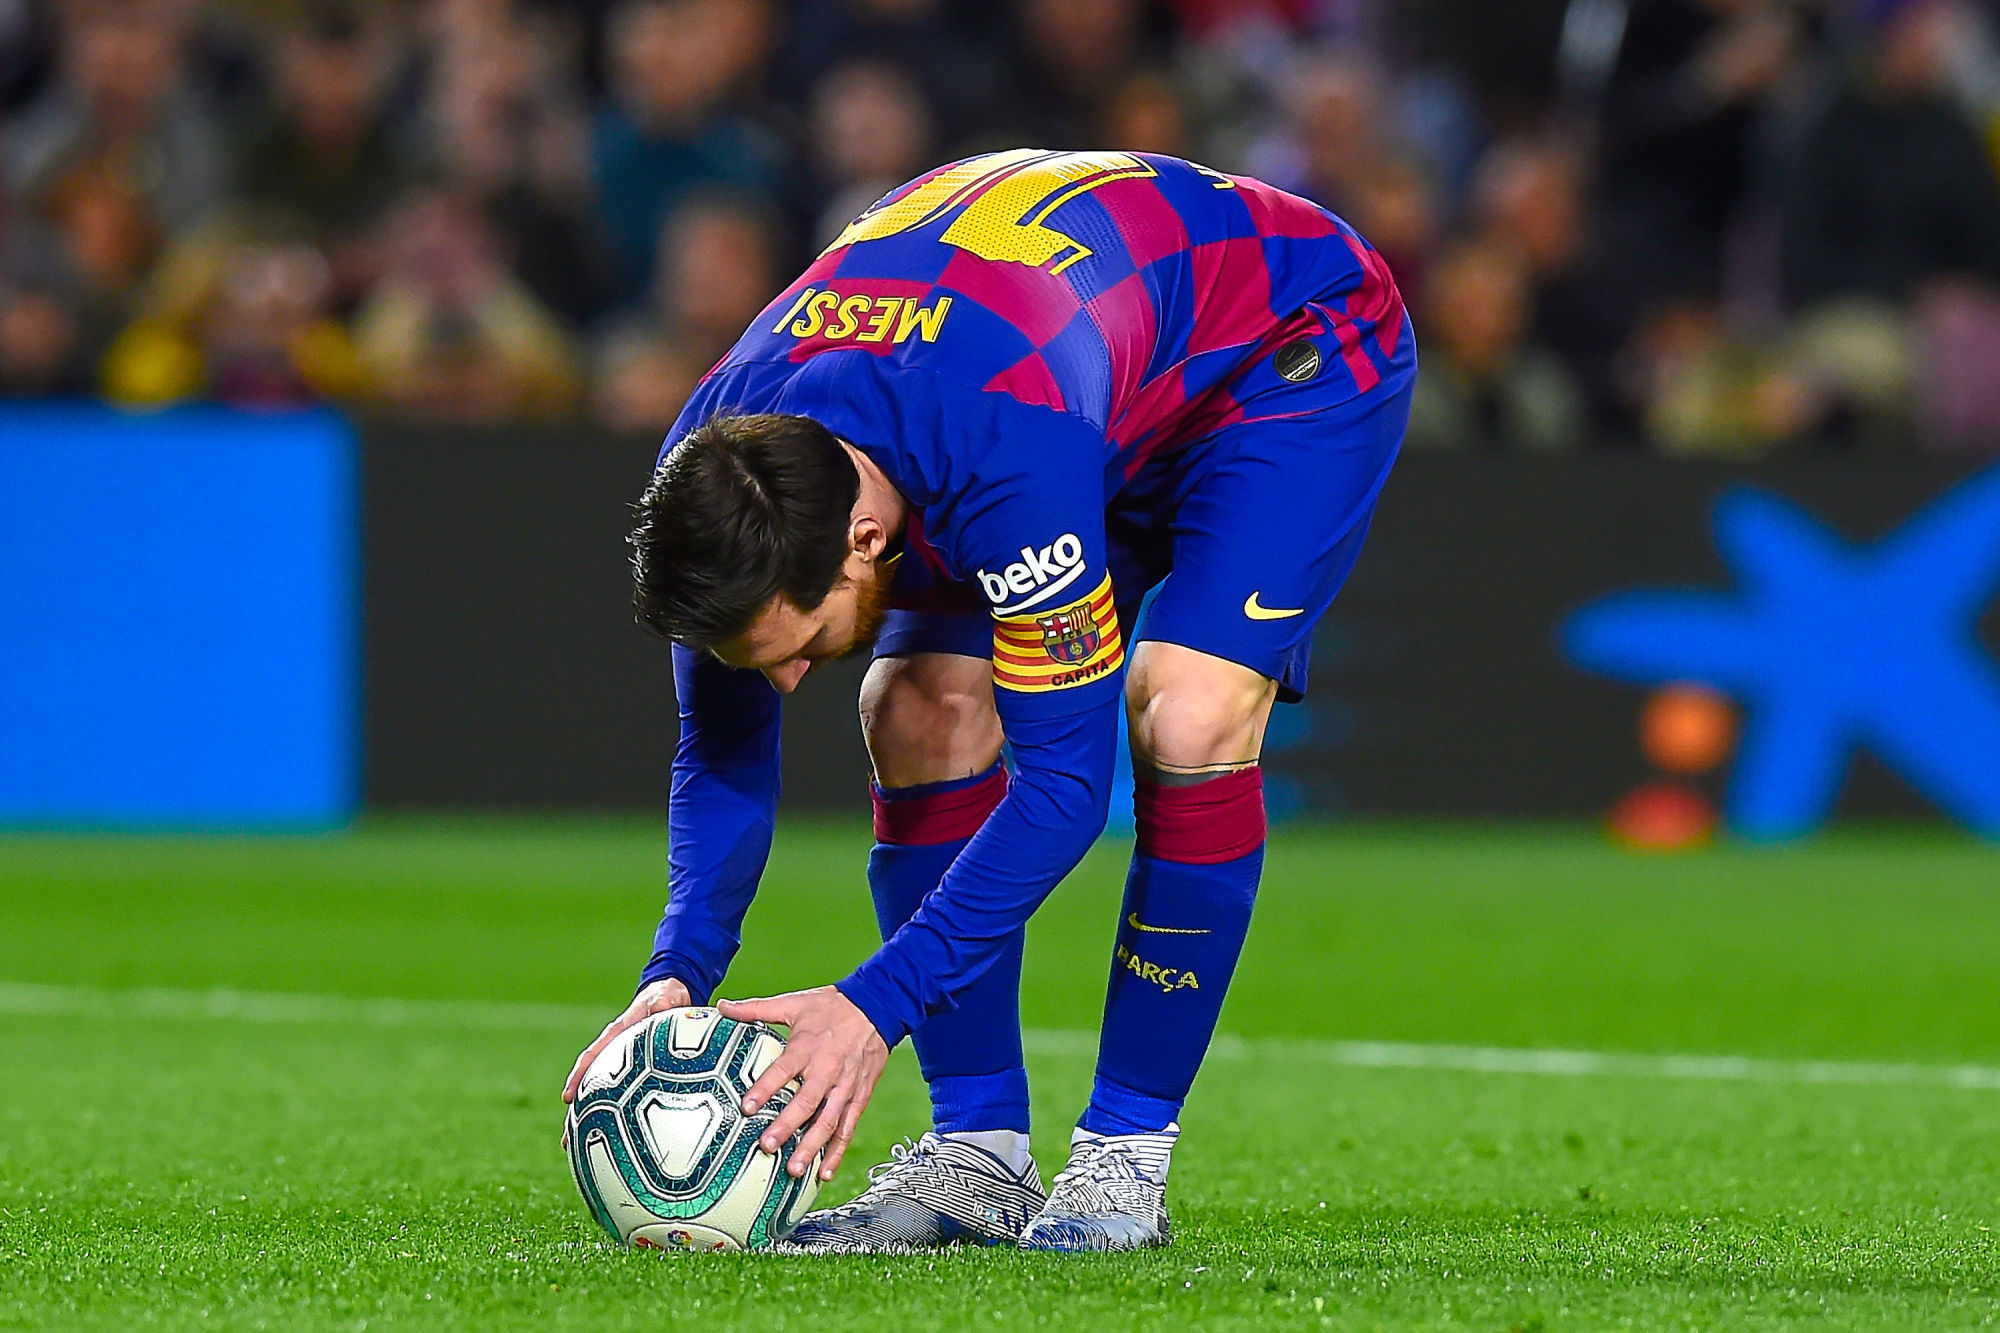 Liga F C Barcelone Leganes Assurer L Essentiel A Domicile Furia Liga